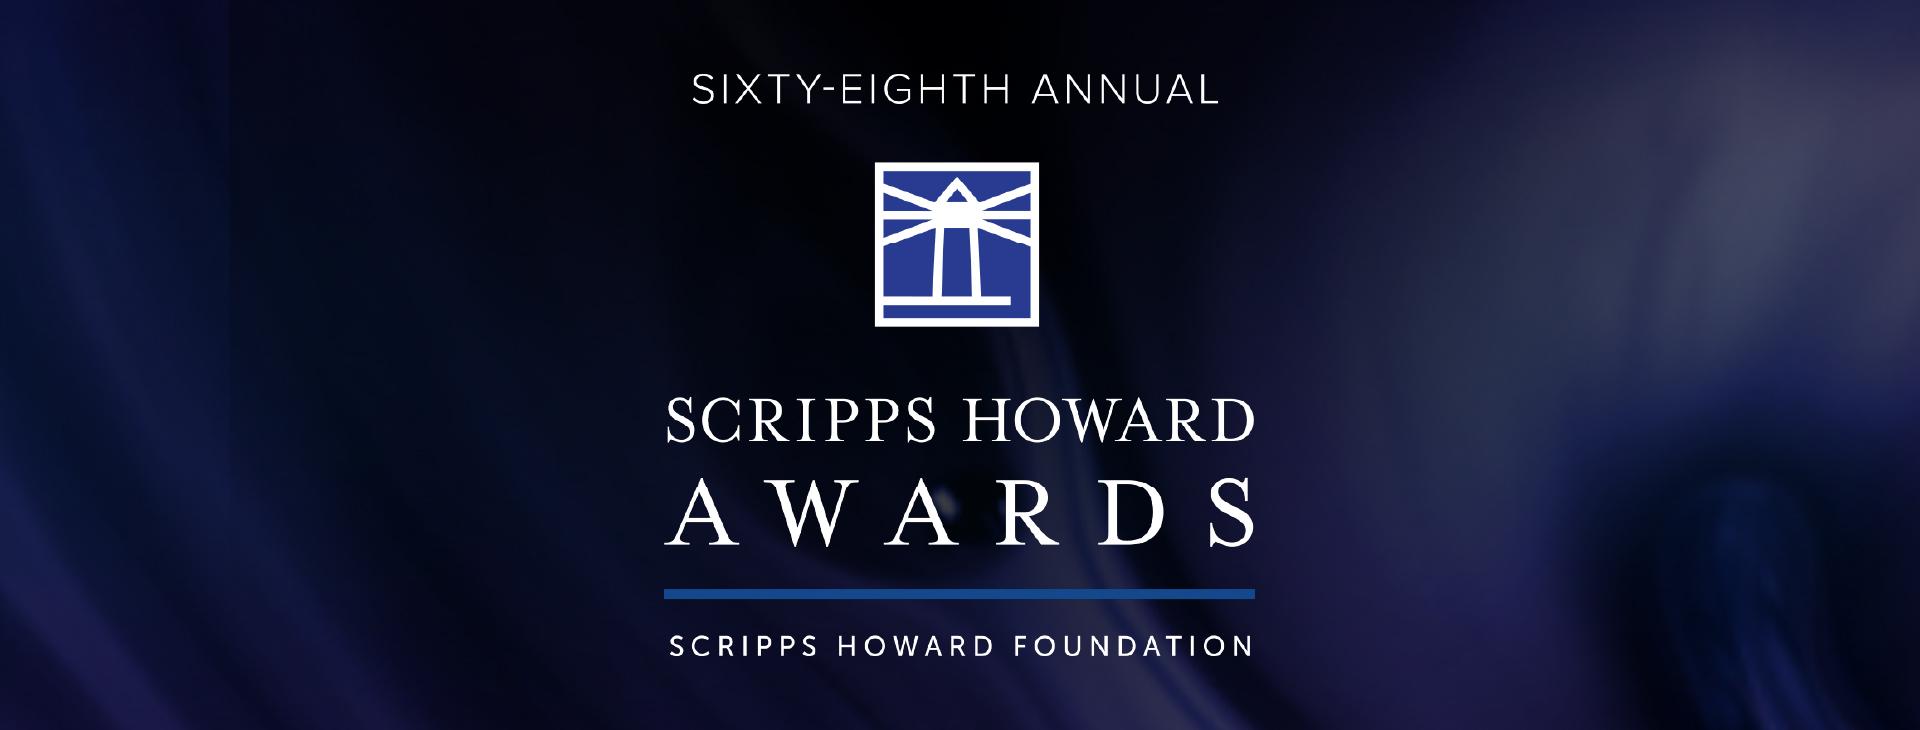 68th Annual Scripps Howard Awards